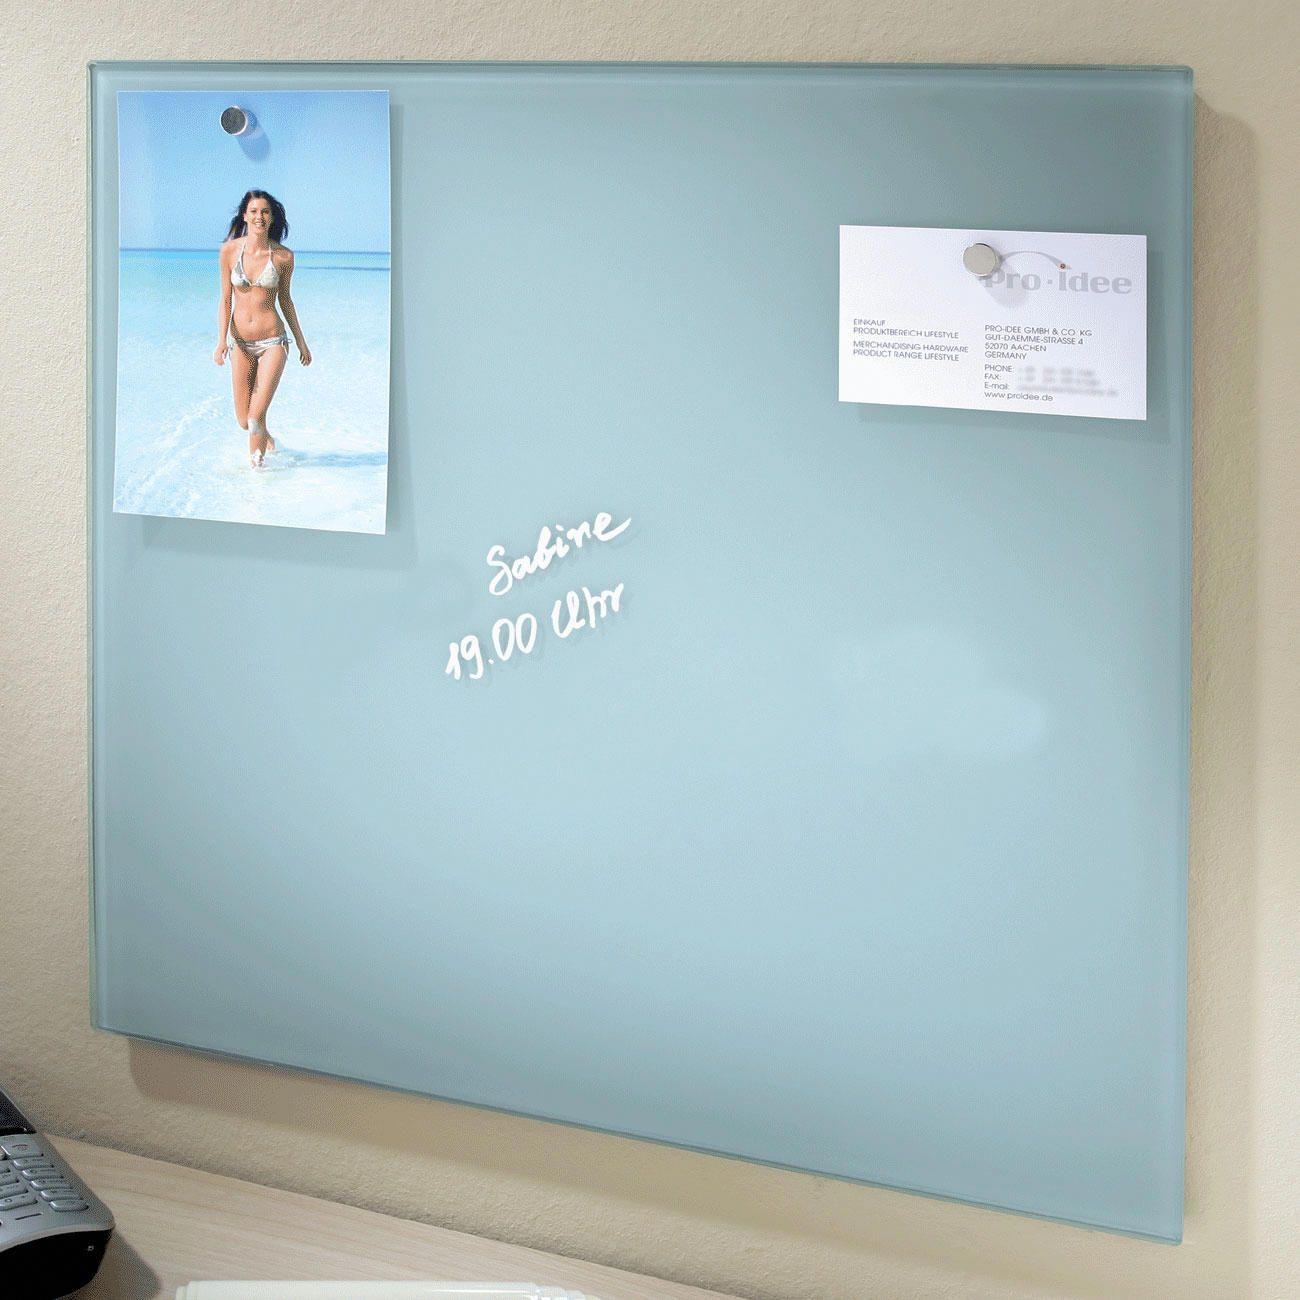 Glass Magnetic Board The Modern Version Of The Pin Board Home Interior Design Ideas Magnetic Board Glass Board Kitchen Notice Board